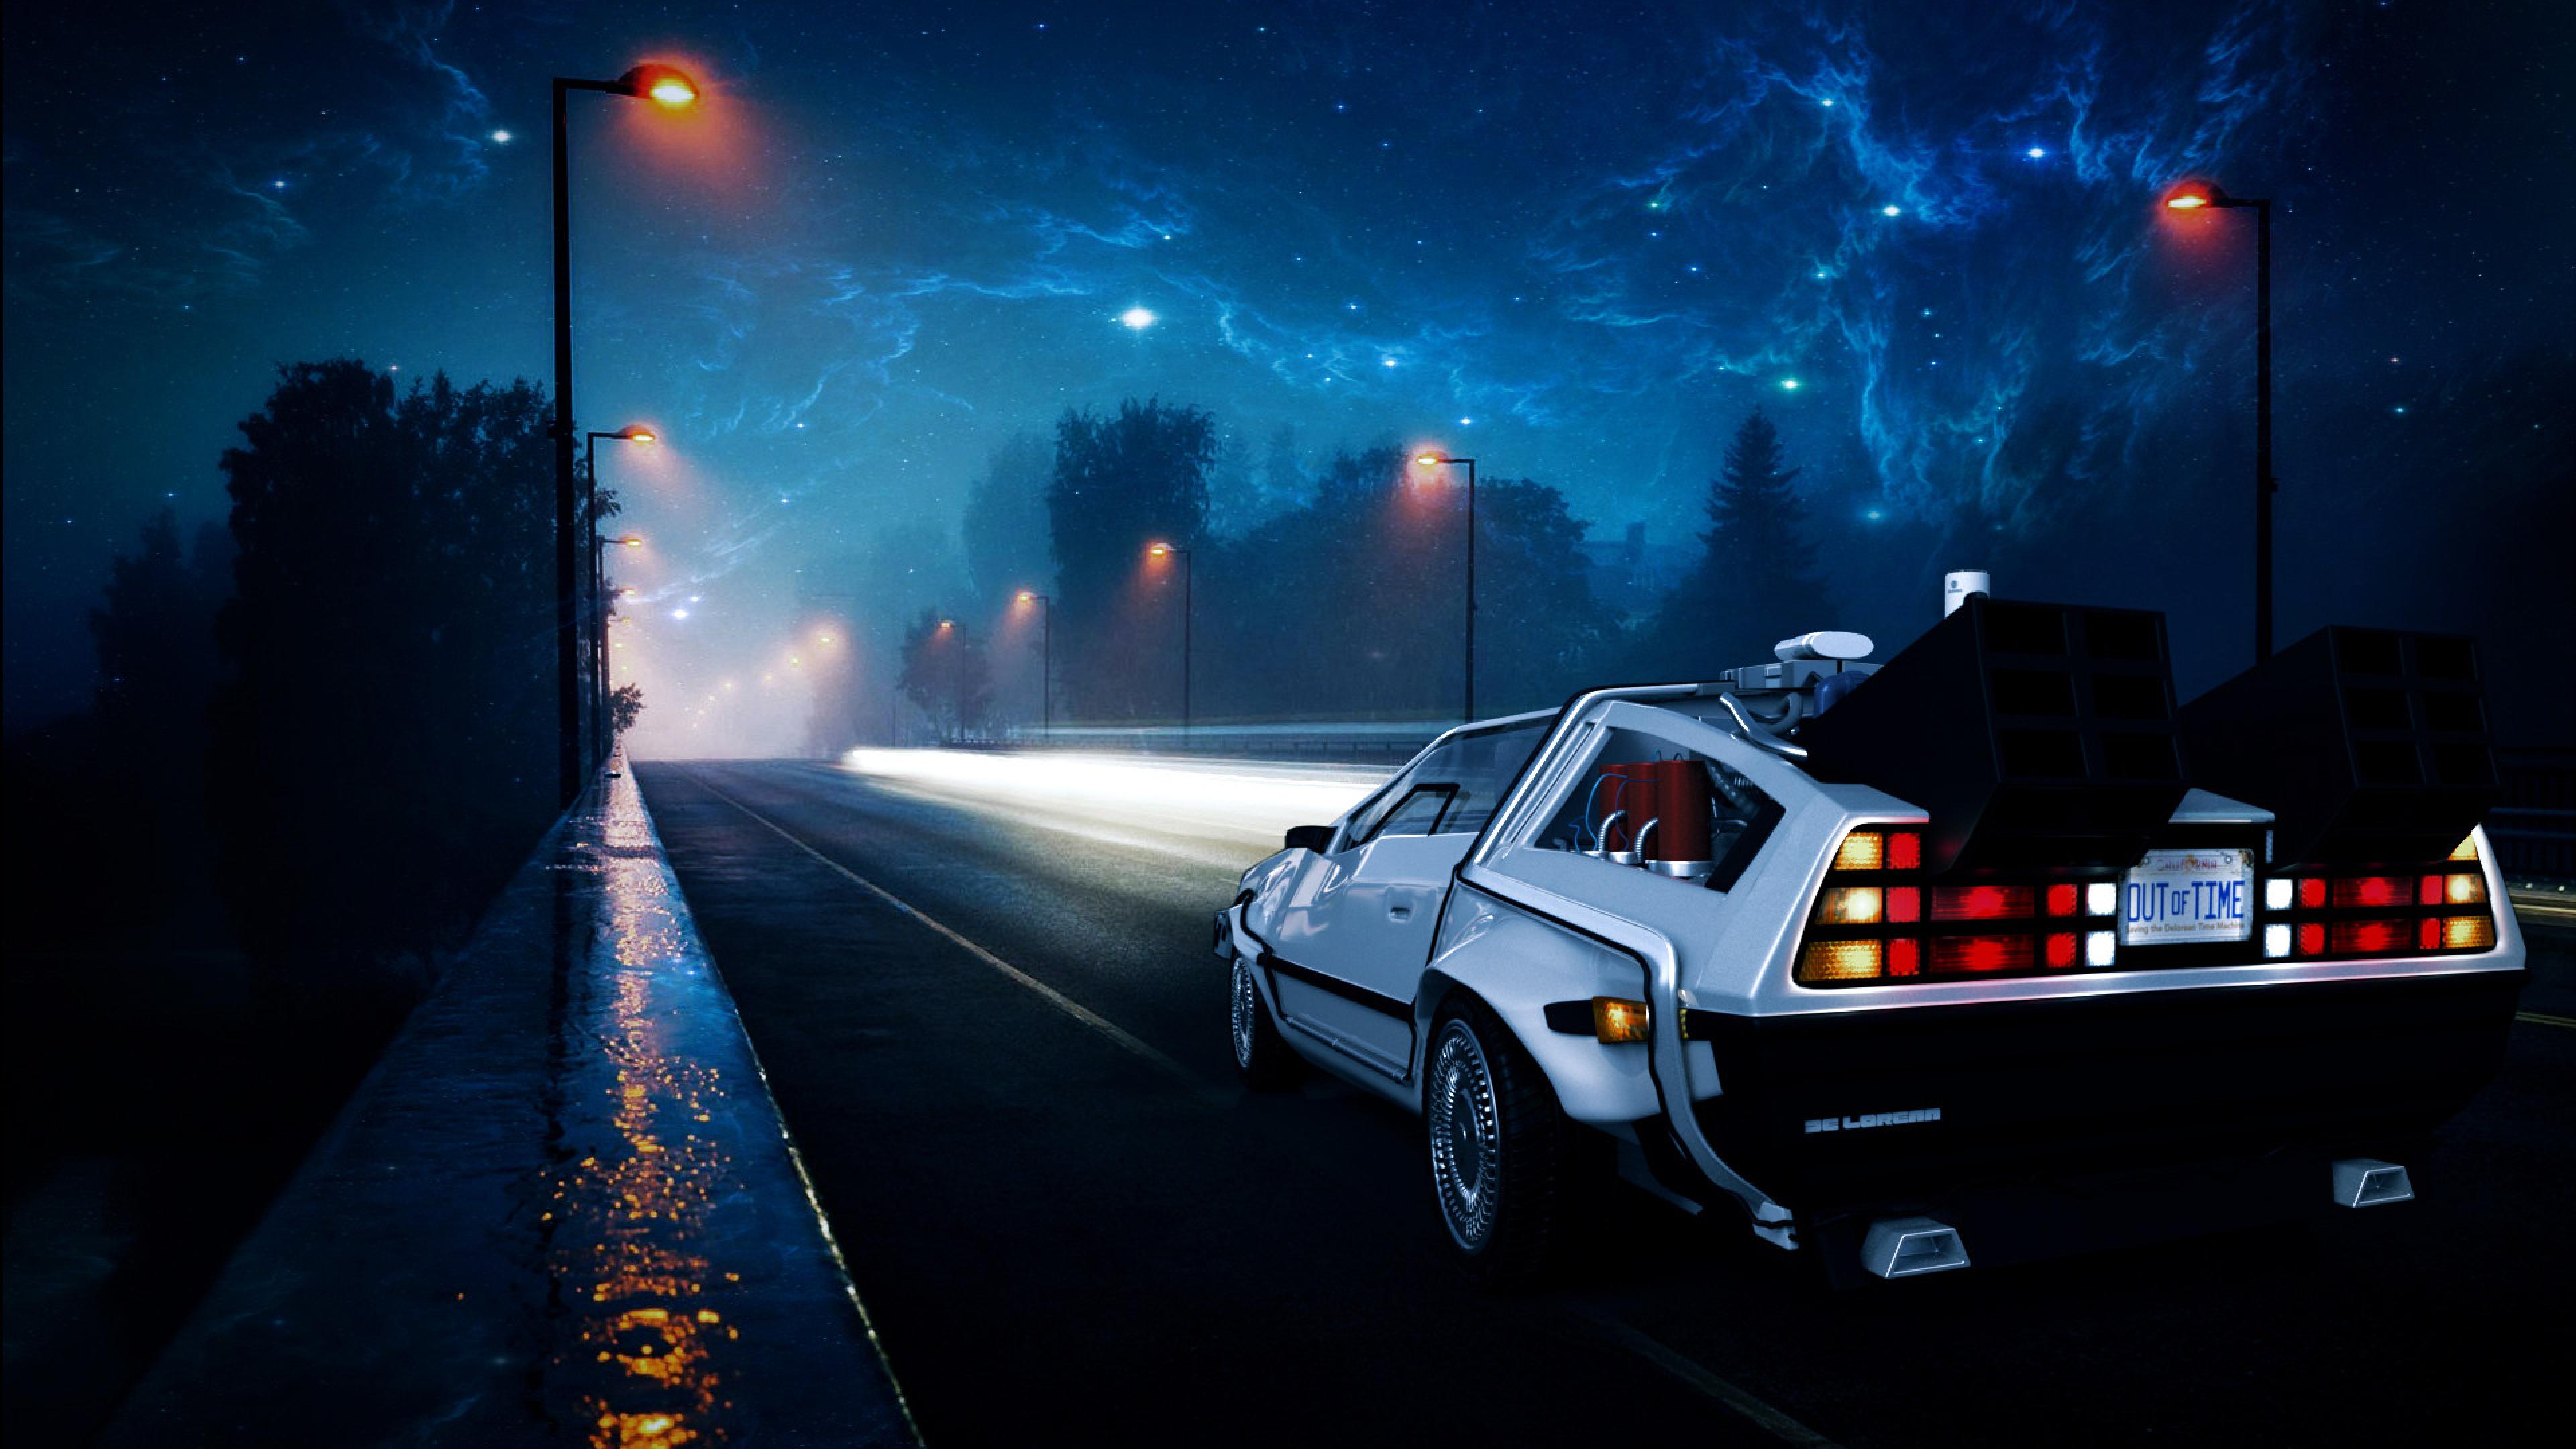 3840x2160 Back To The Future Delorean Car Illustration 4k